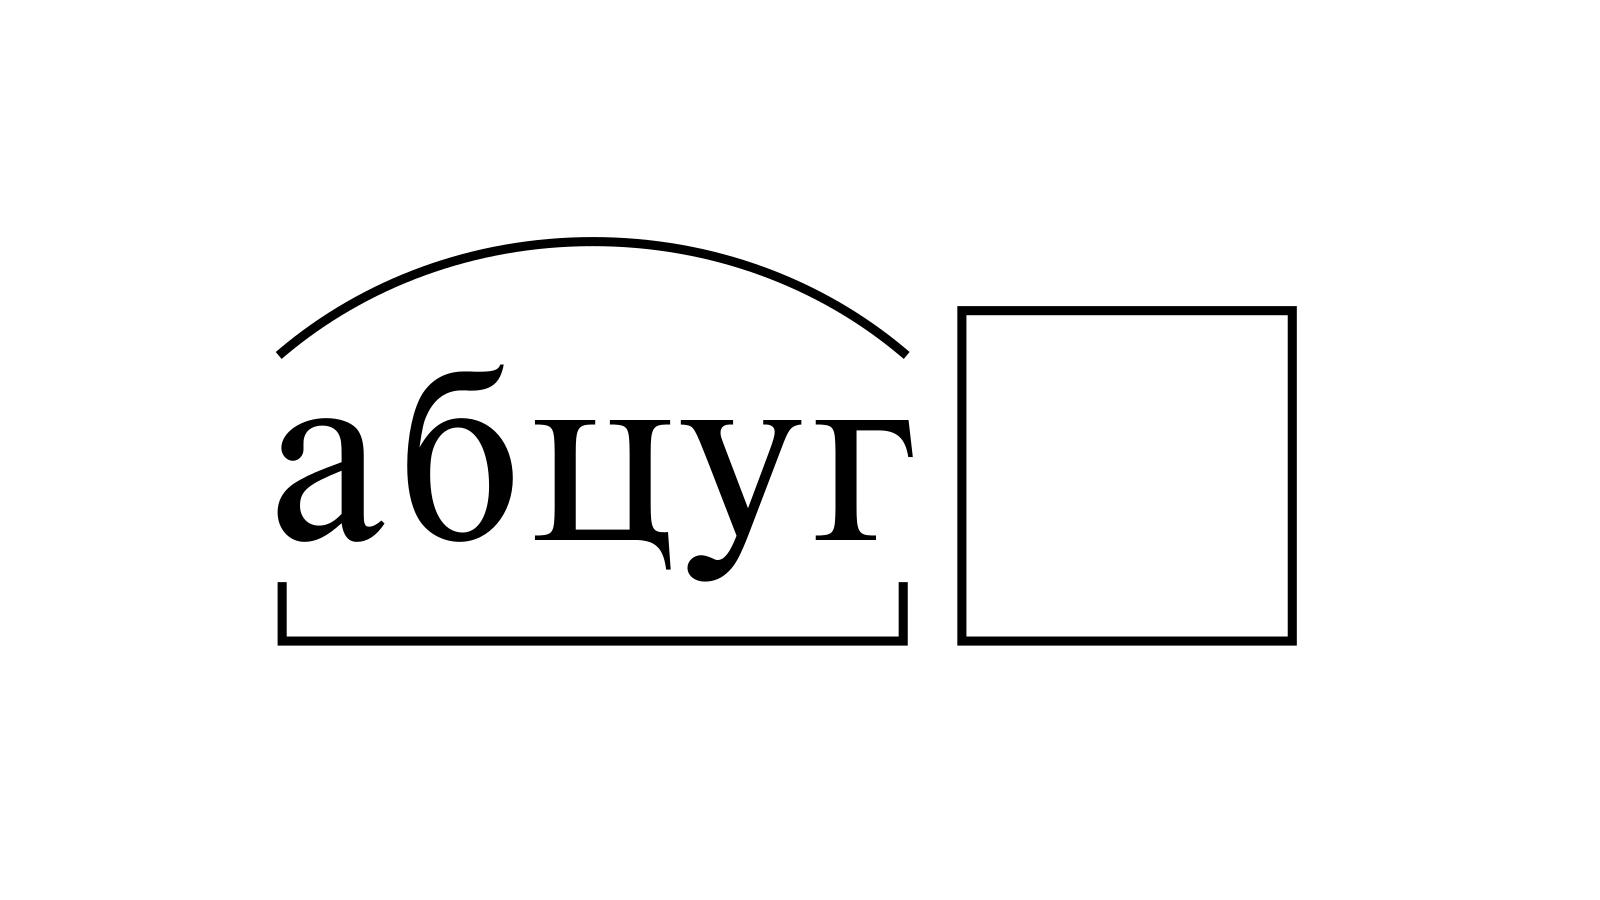 Разбор слова «абцуг» по составу